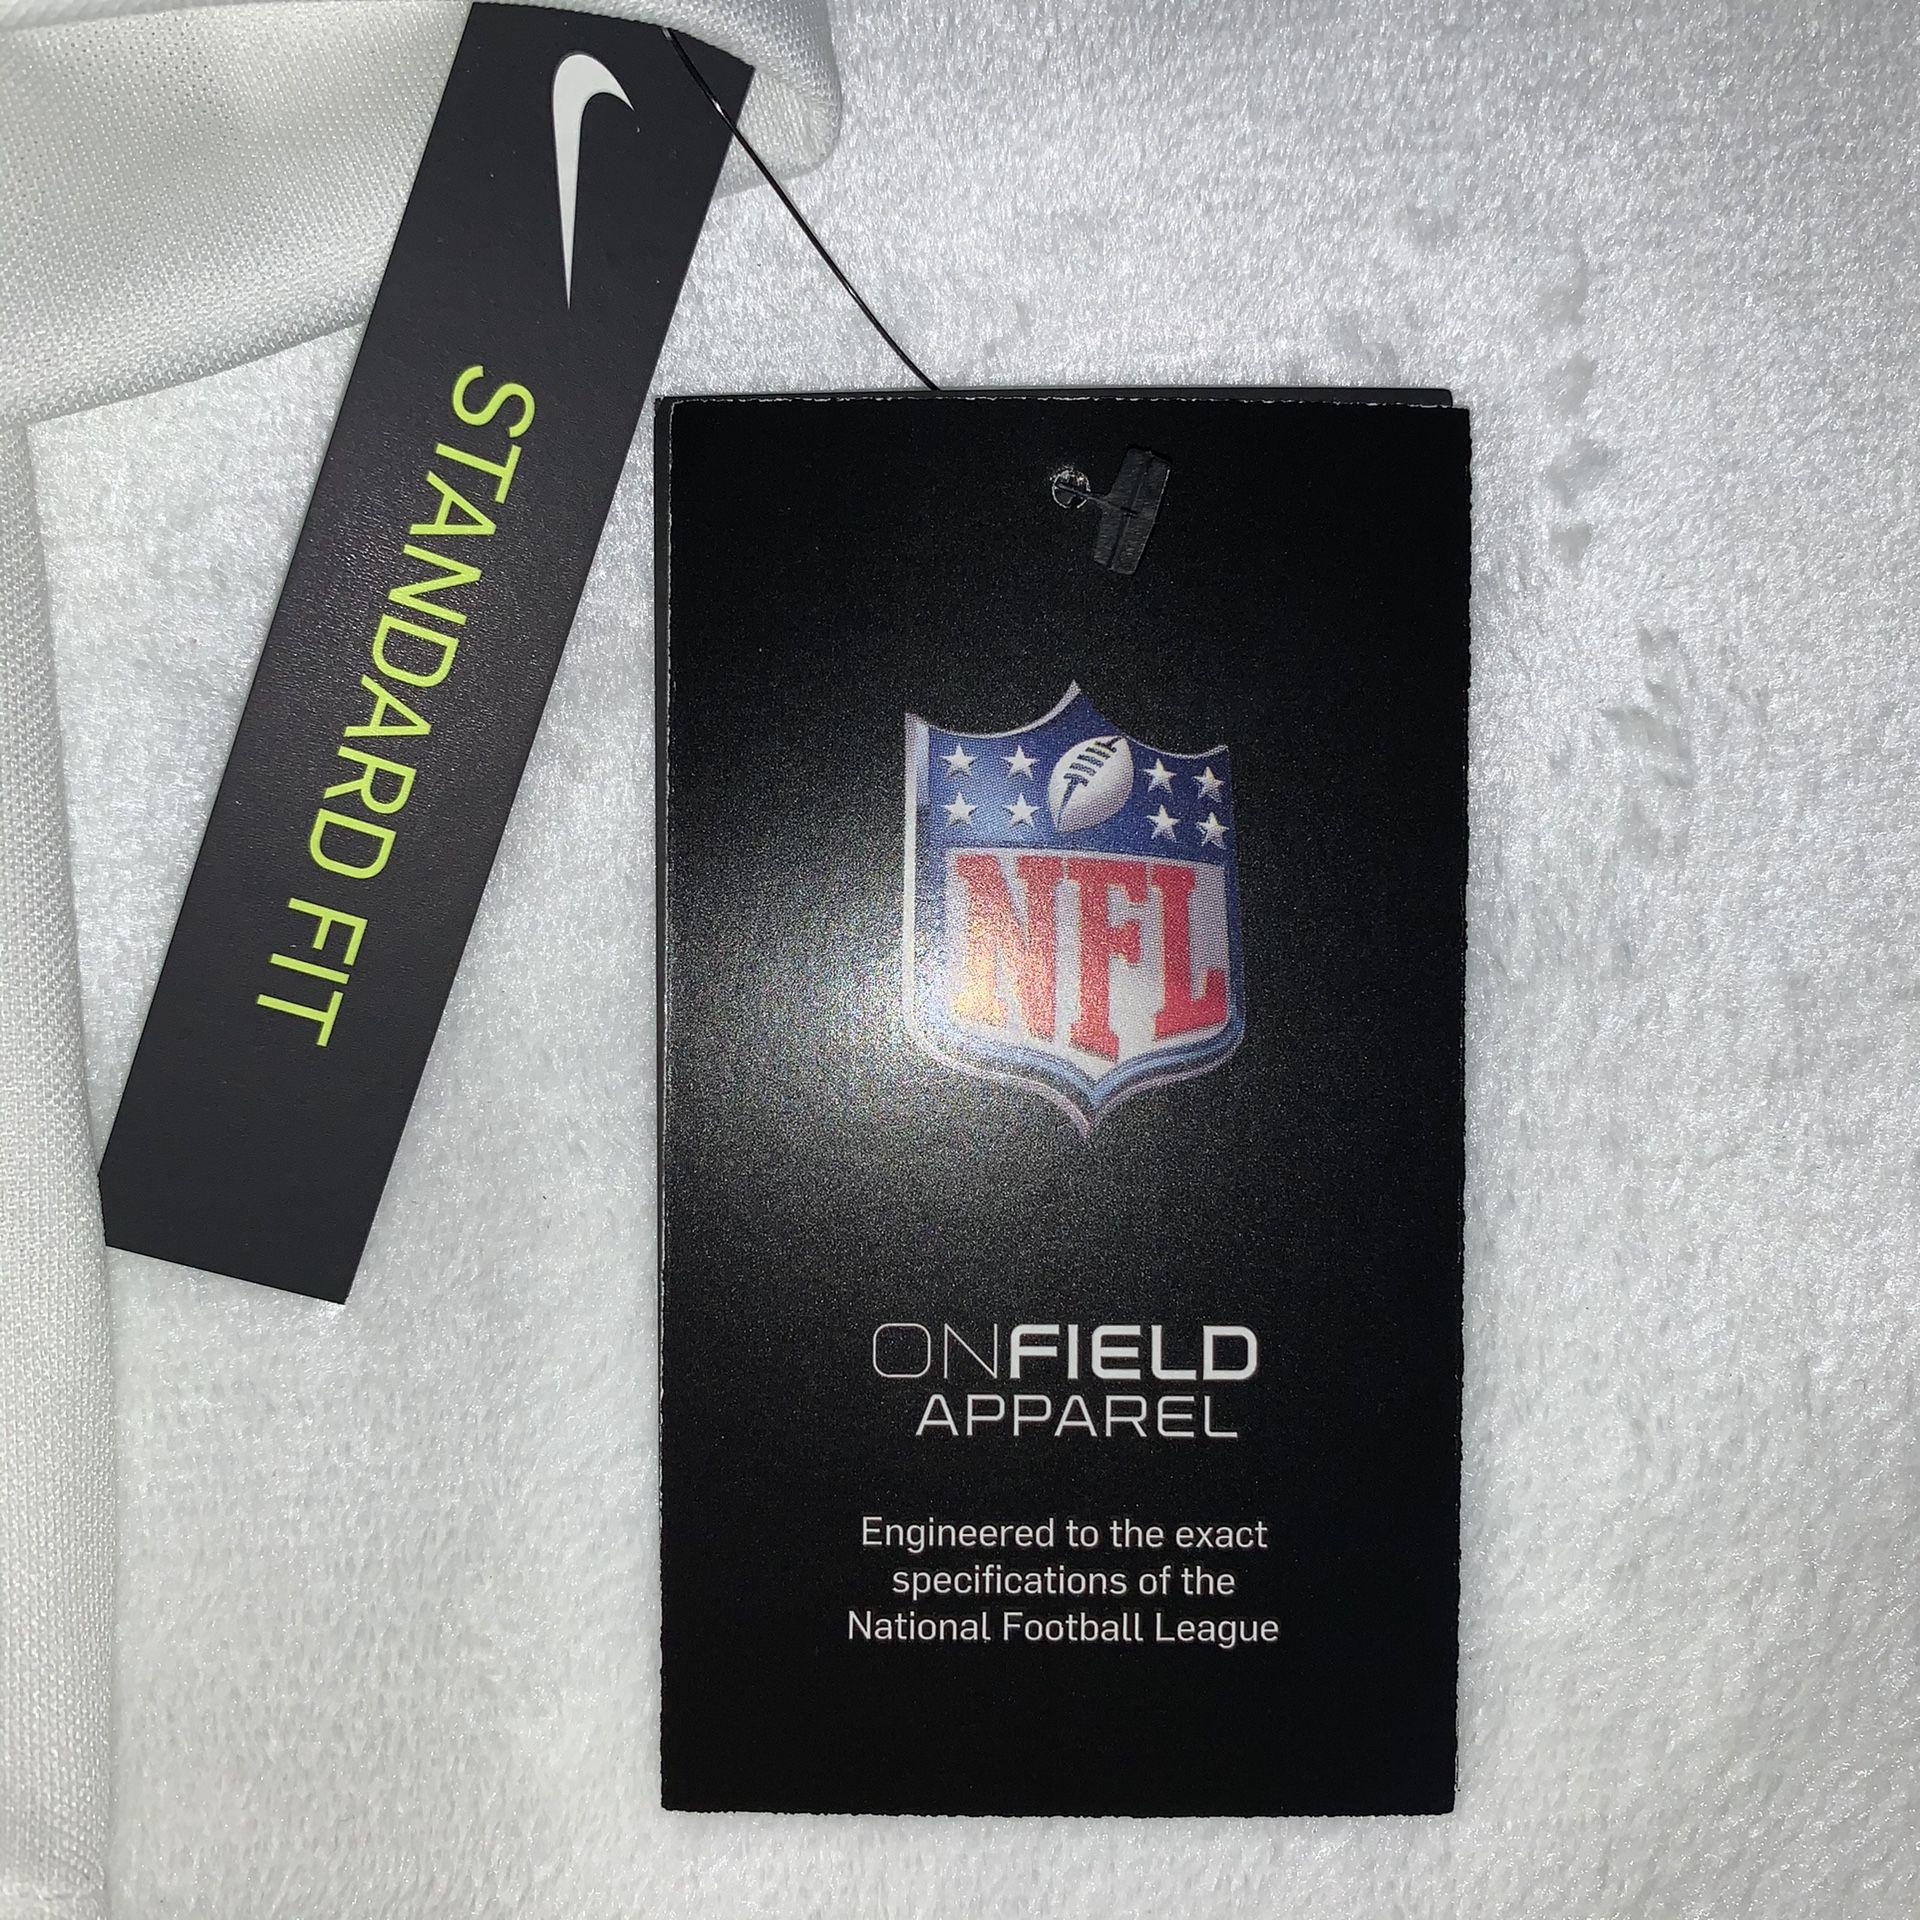 Sam Darnold Nike New York Jets NFL Vapor Limited Jersey Stitched White Size Medium Tags Still On Retail Price 150$